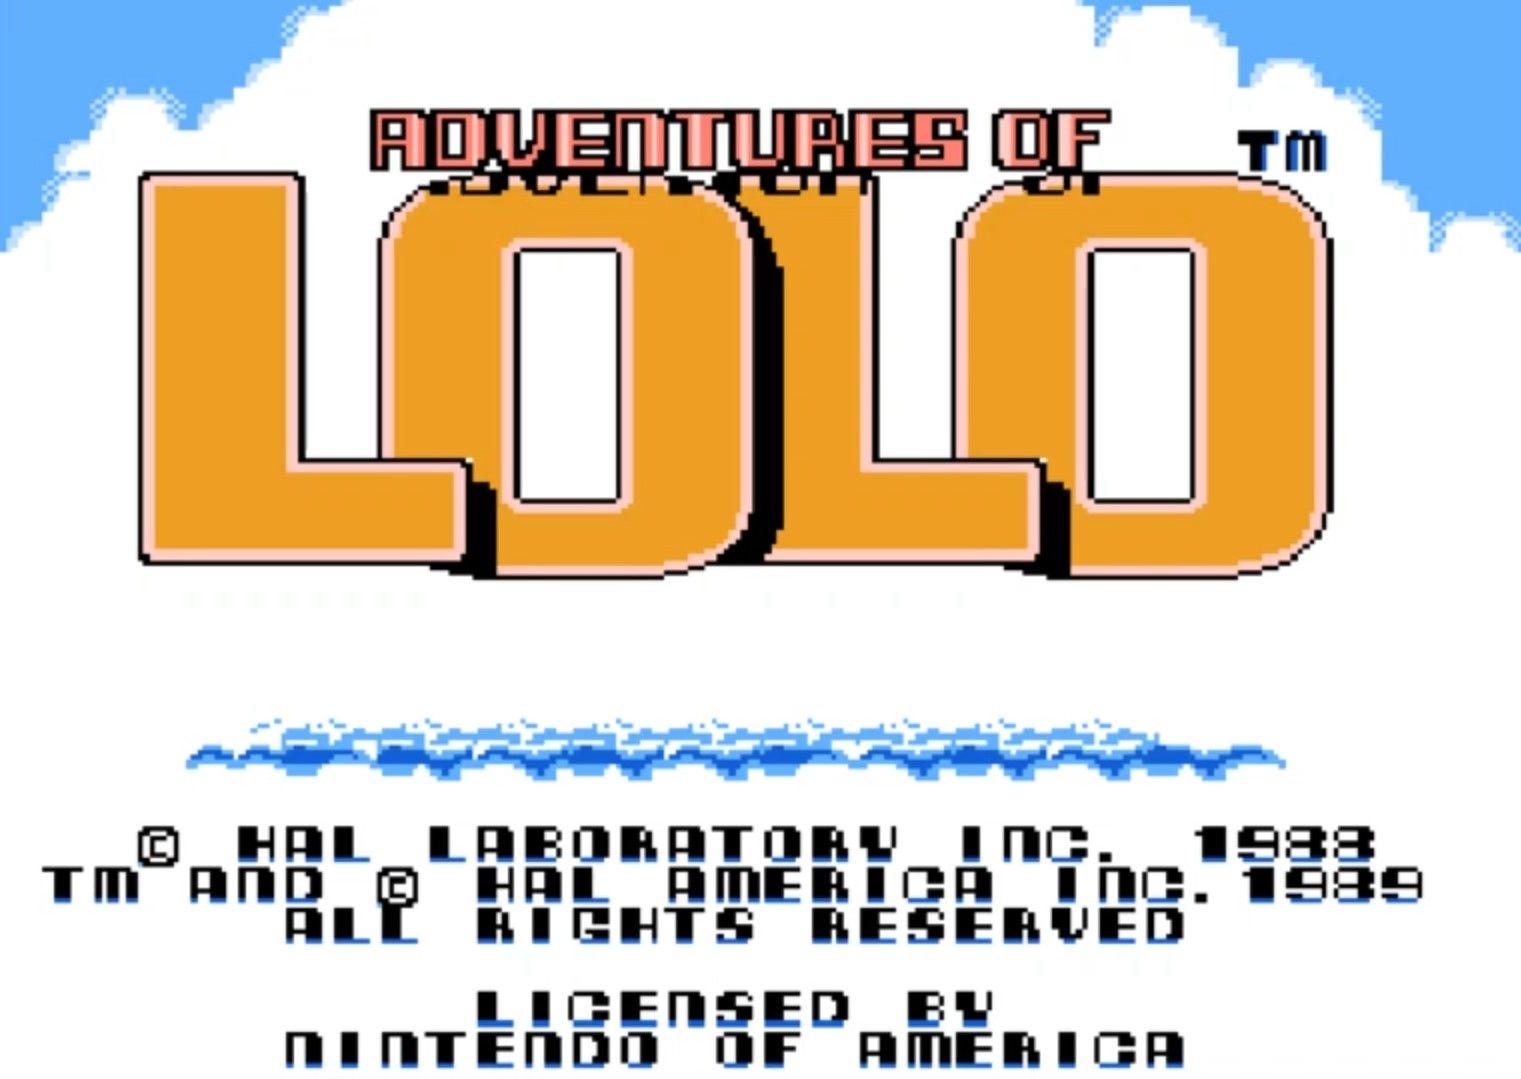 Ecran d'accueil de Adventures Of Lolo sur Nintendo NES #NES #Retrogaming #retrogames #Nintendo #HalLaboratory #letsplayFR #GuiDaFunkyMan